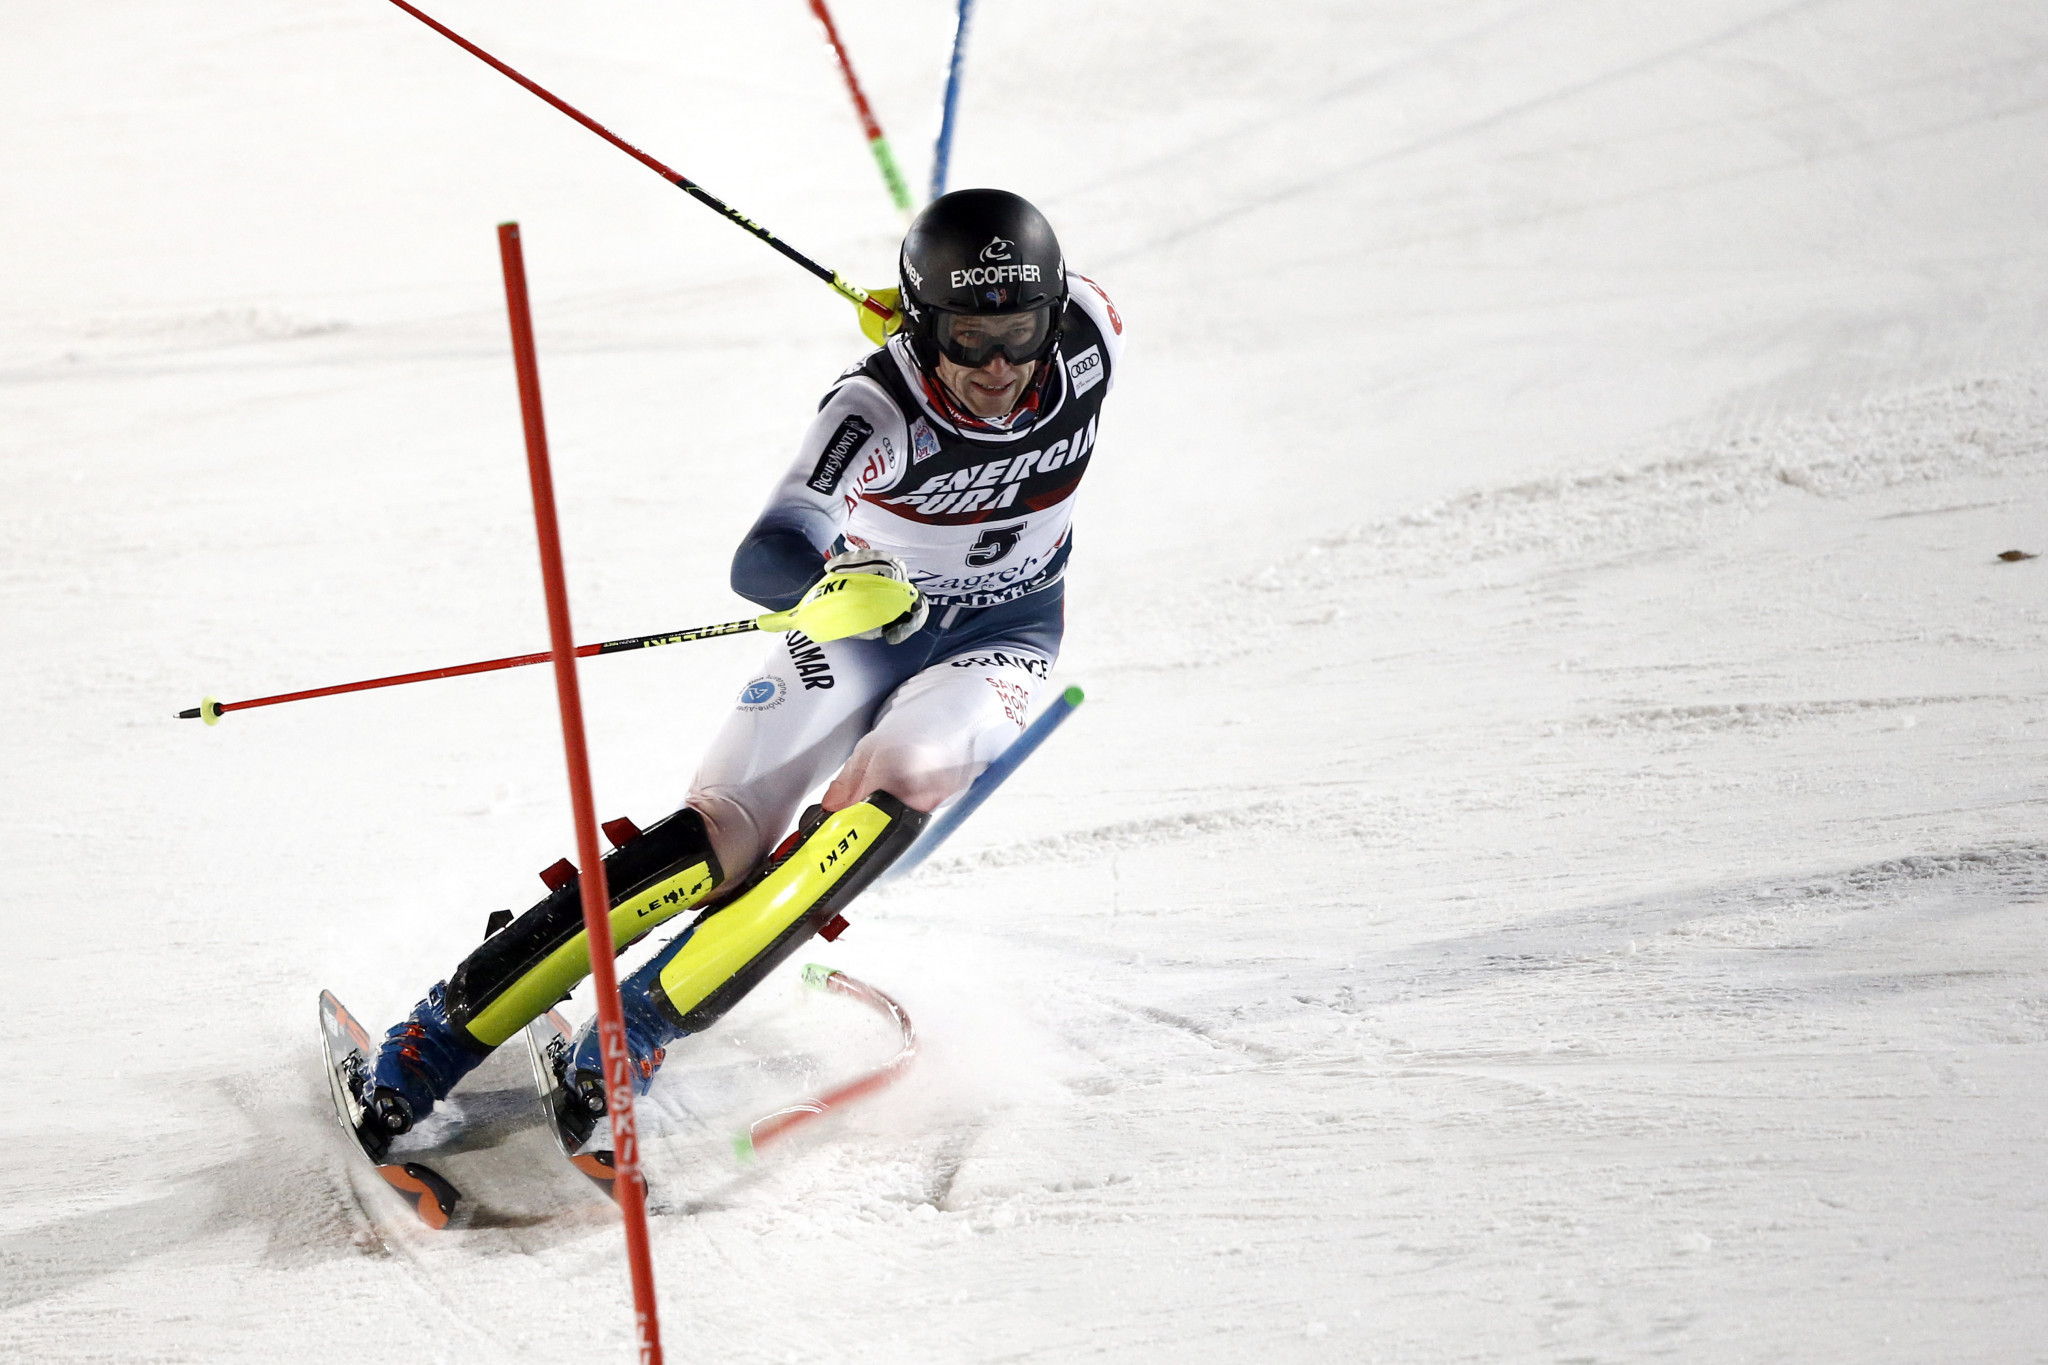 Men's slalom set for FIS Alpine Skiing World Cup in Madonna di Campiglio